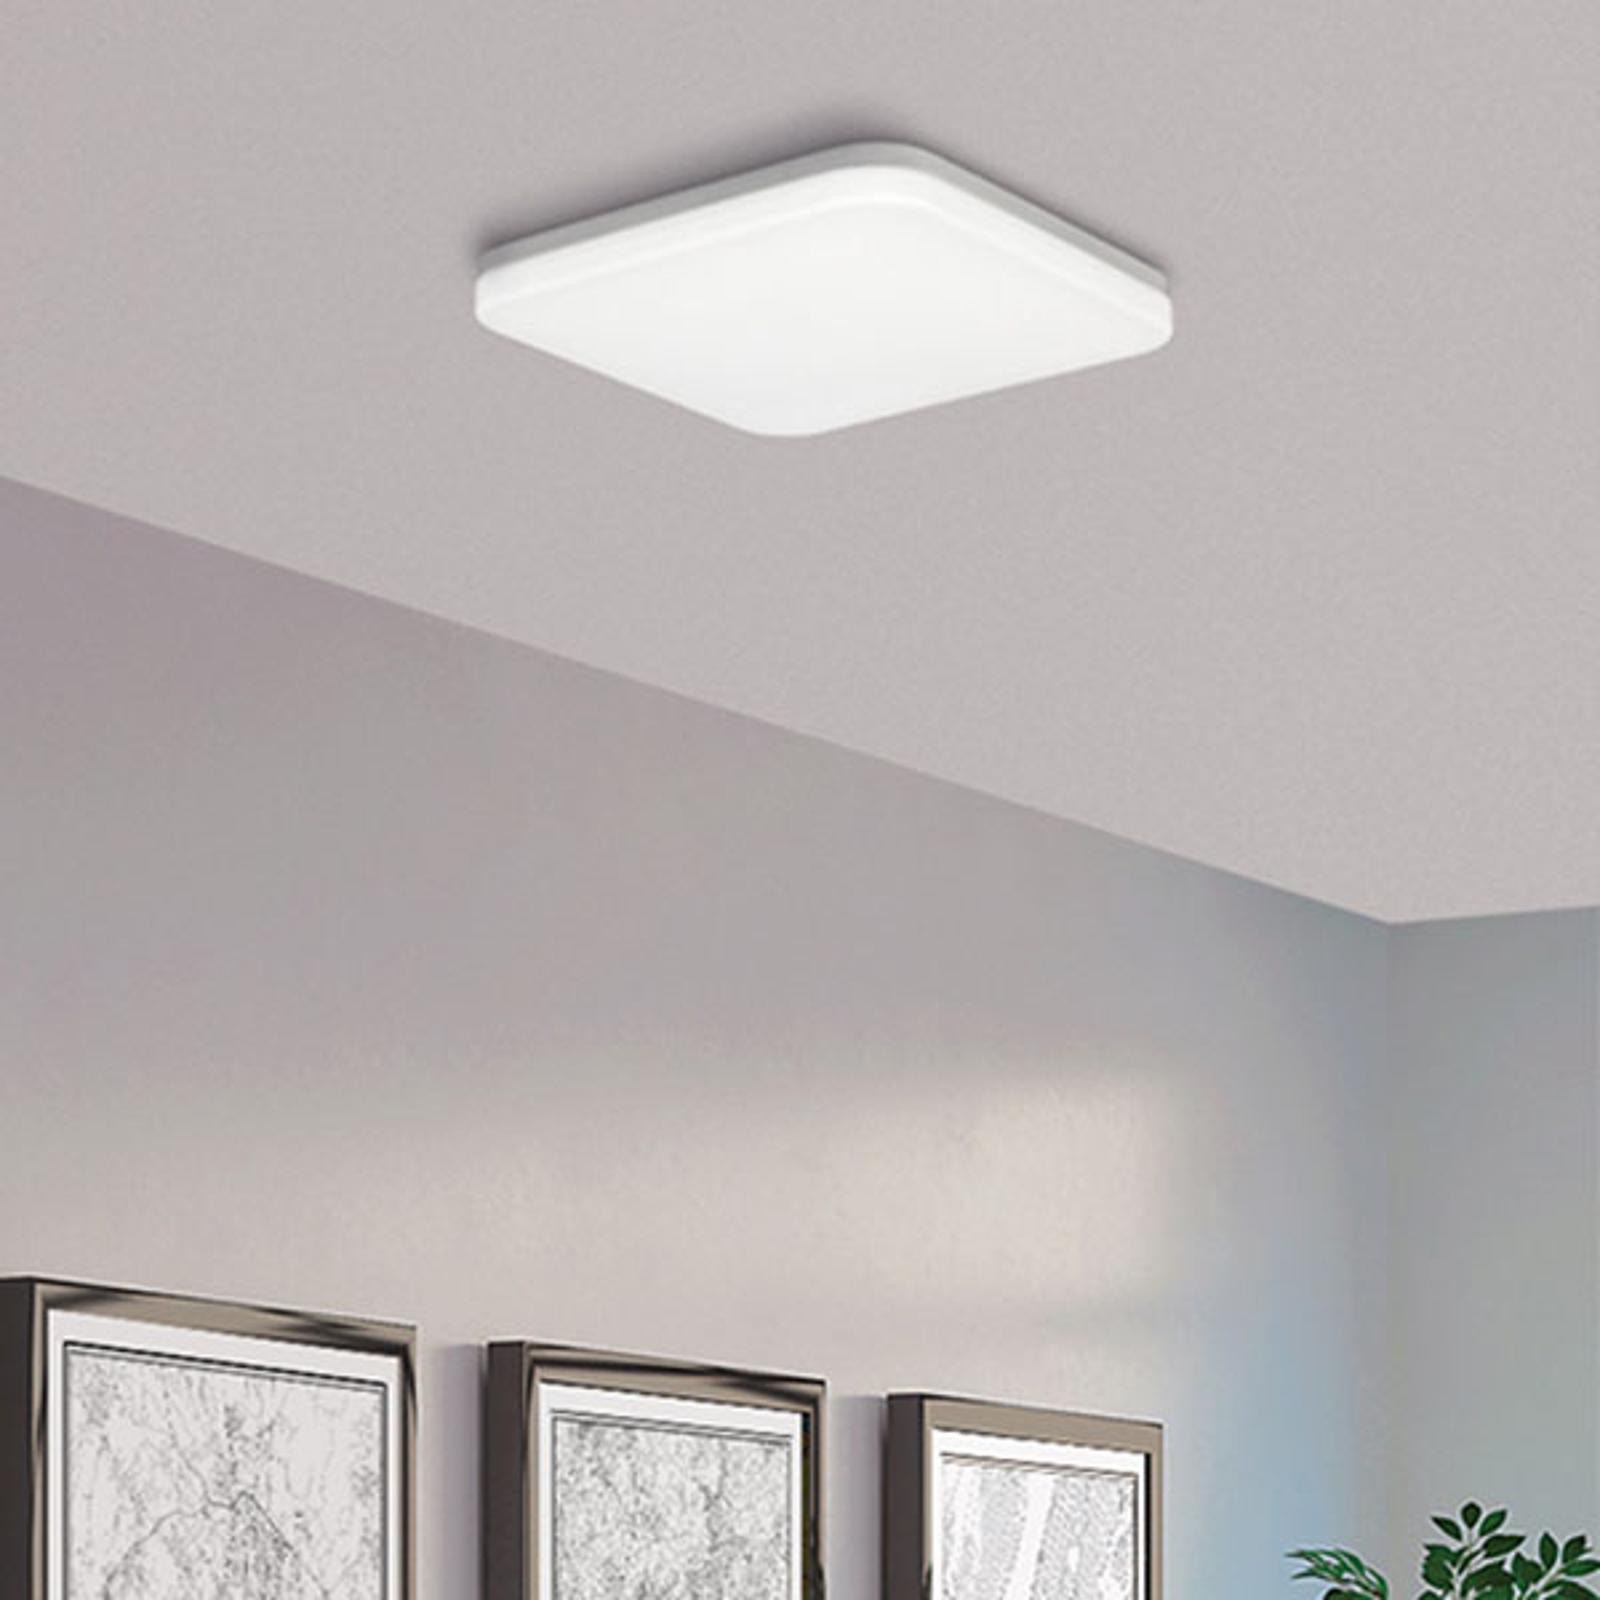 Lampa sufitowa LED Uzza, Triac, 3000K, z Casambi